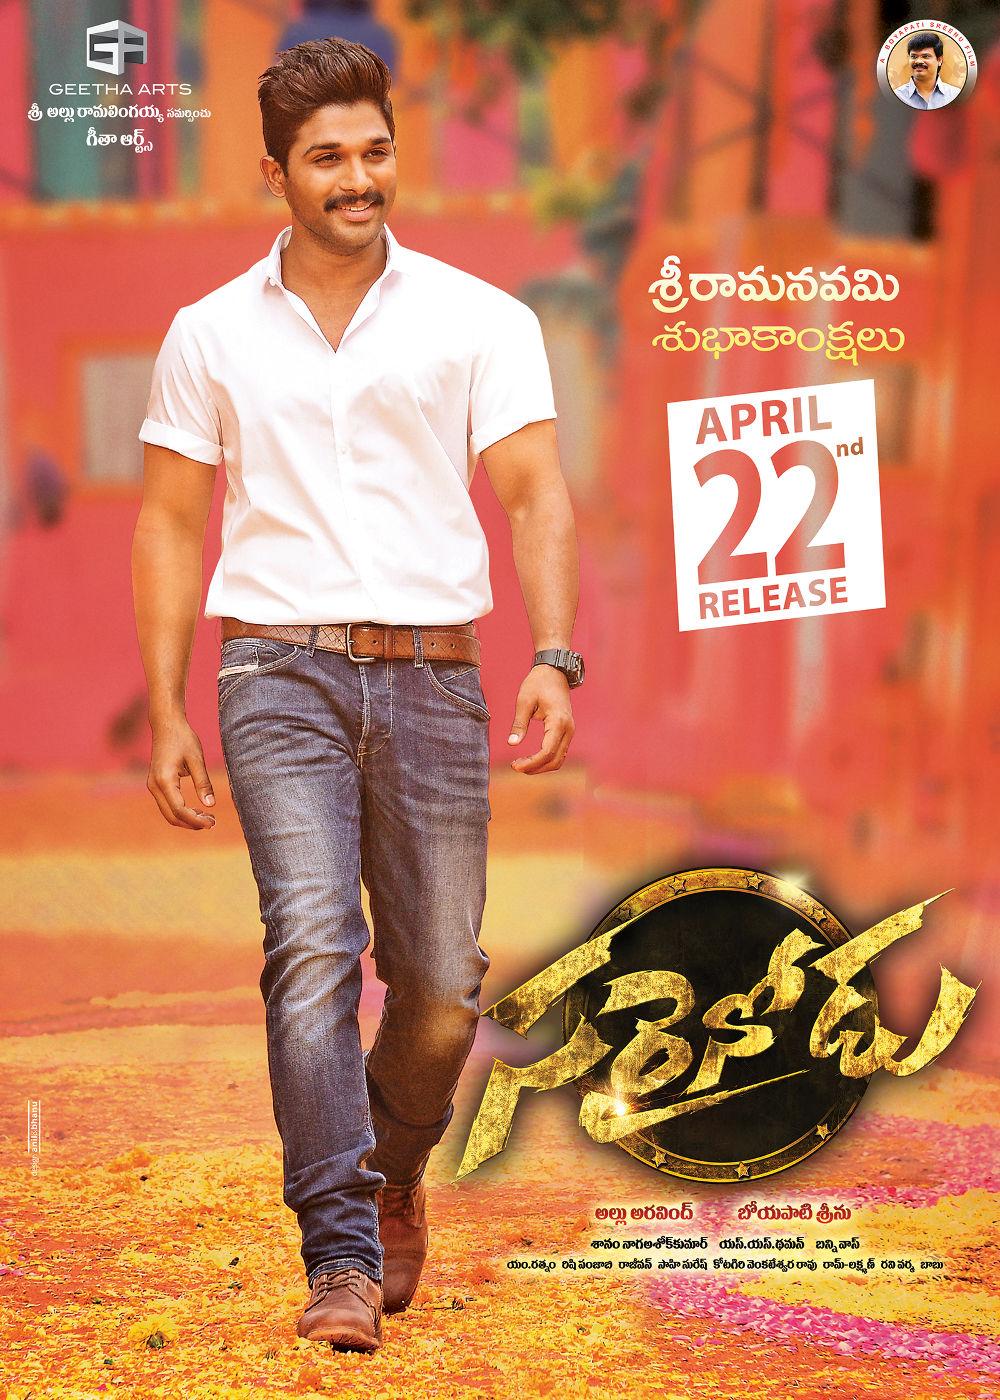 Allu Arjun Sarrainodu Movie Rama Navami Special Poster